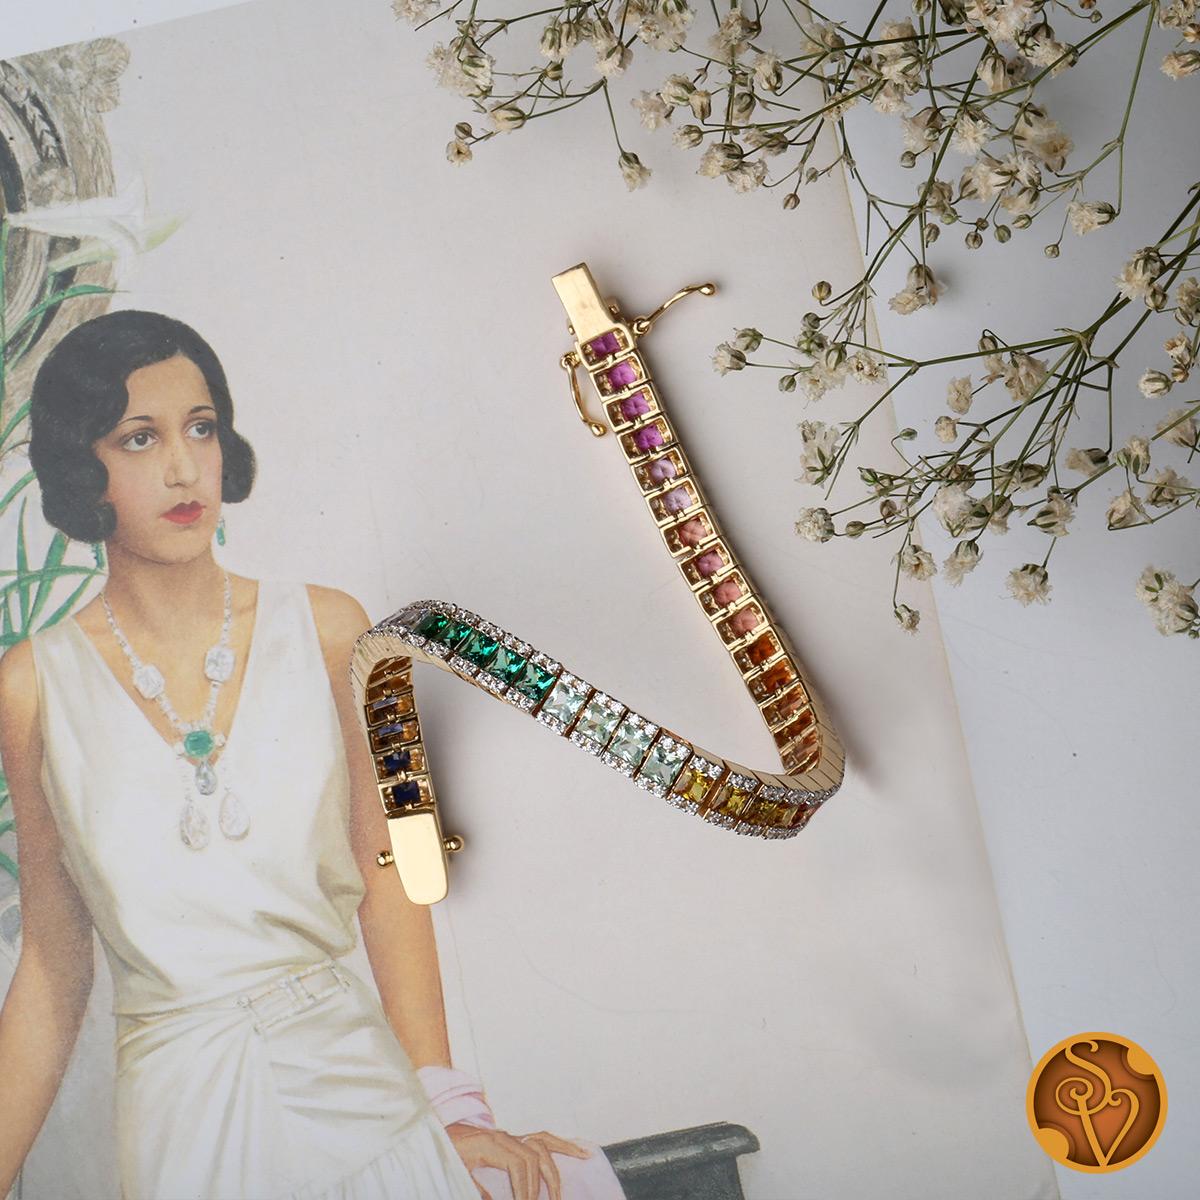 Compacting Colourful Bracelet